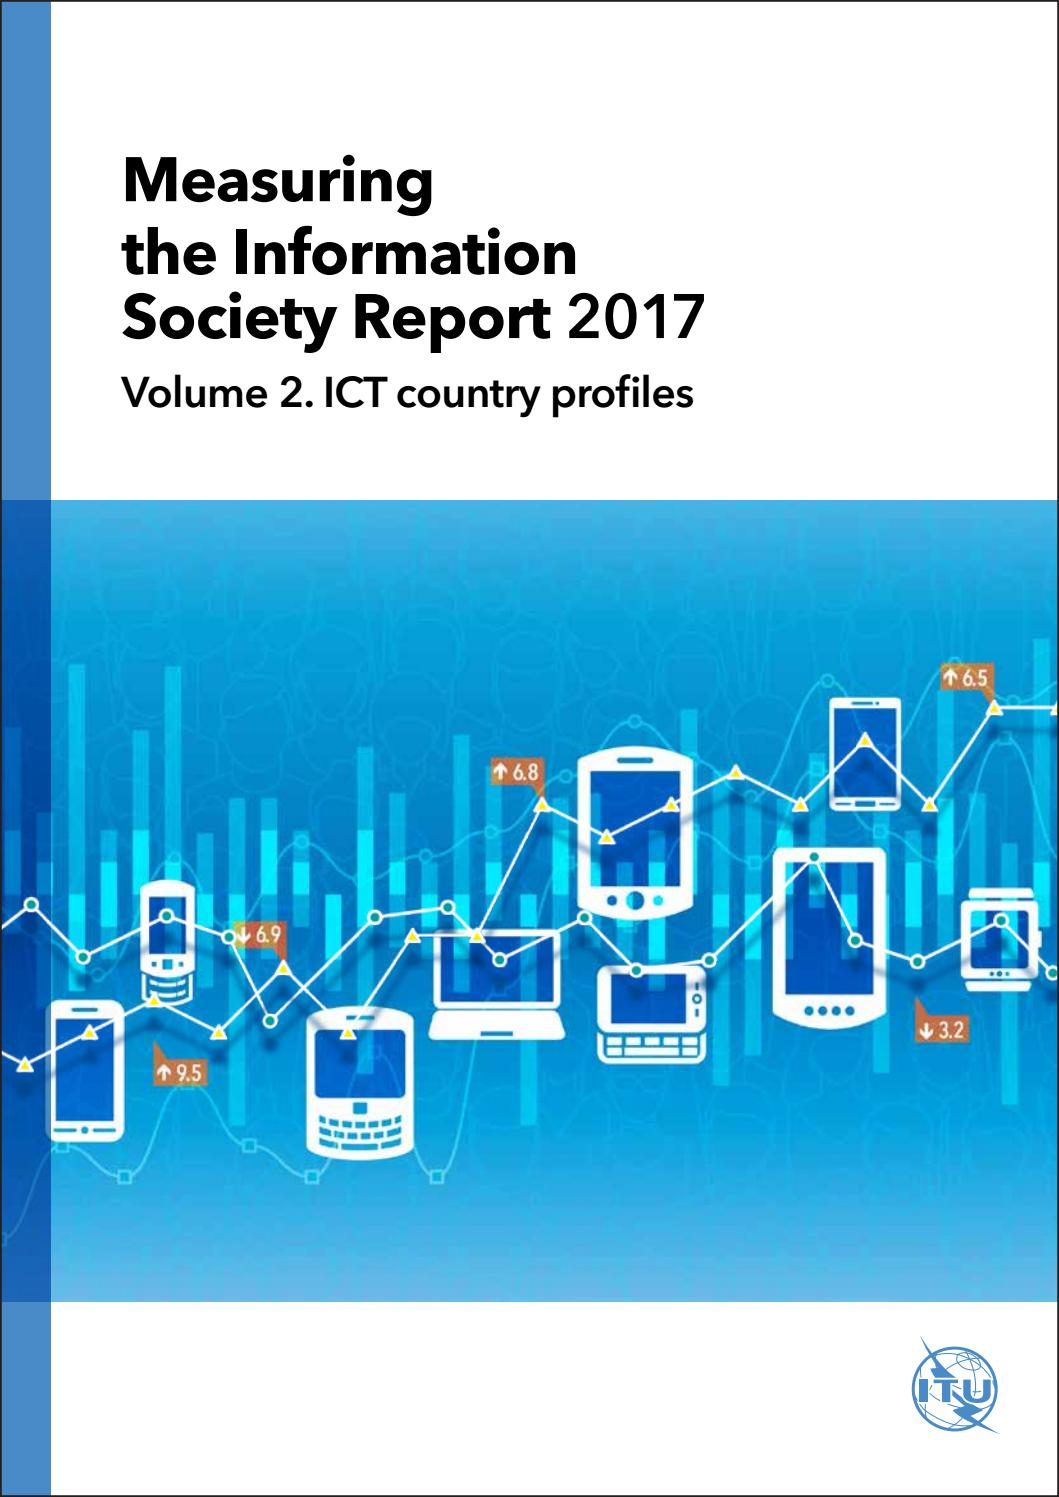 Misr2017 volume2 by الجمعية العلمية لمهندسى الاتصالات - issuu